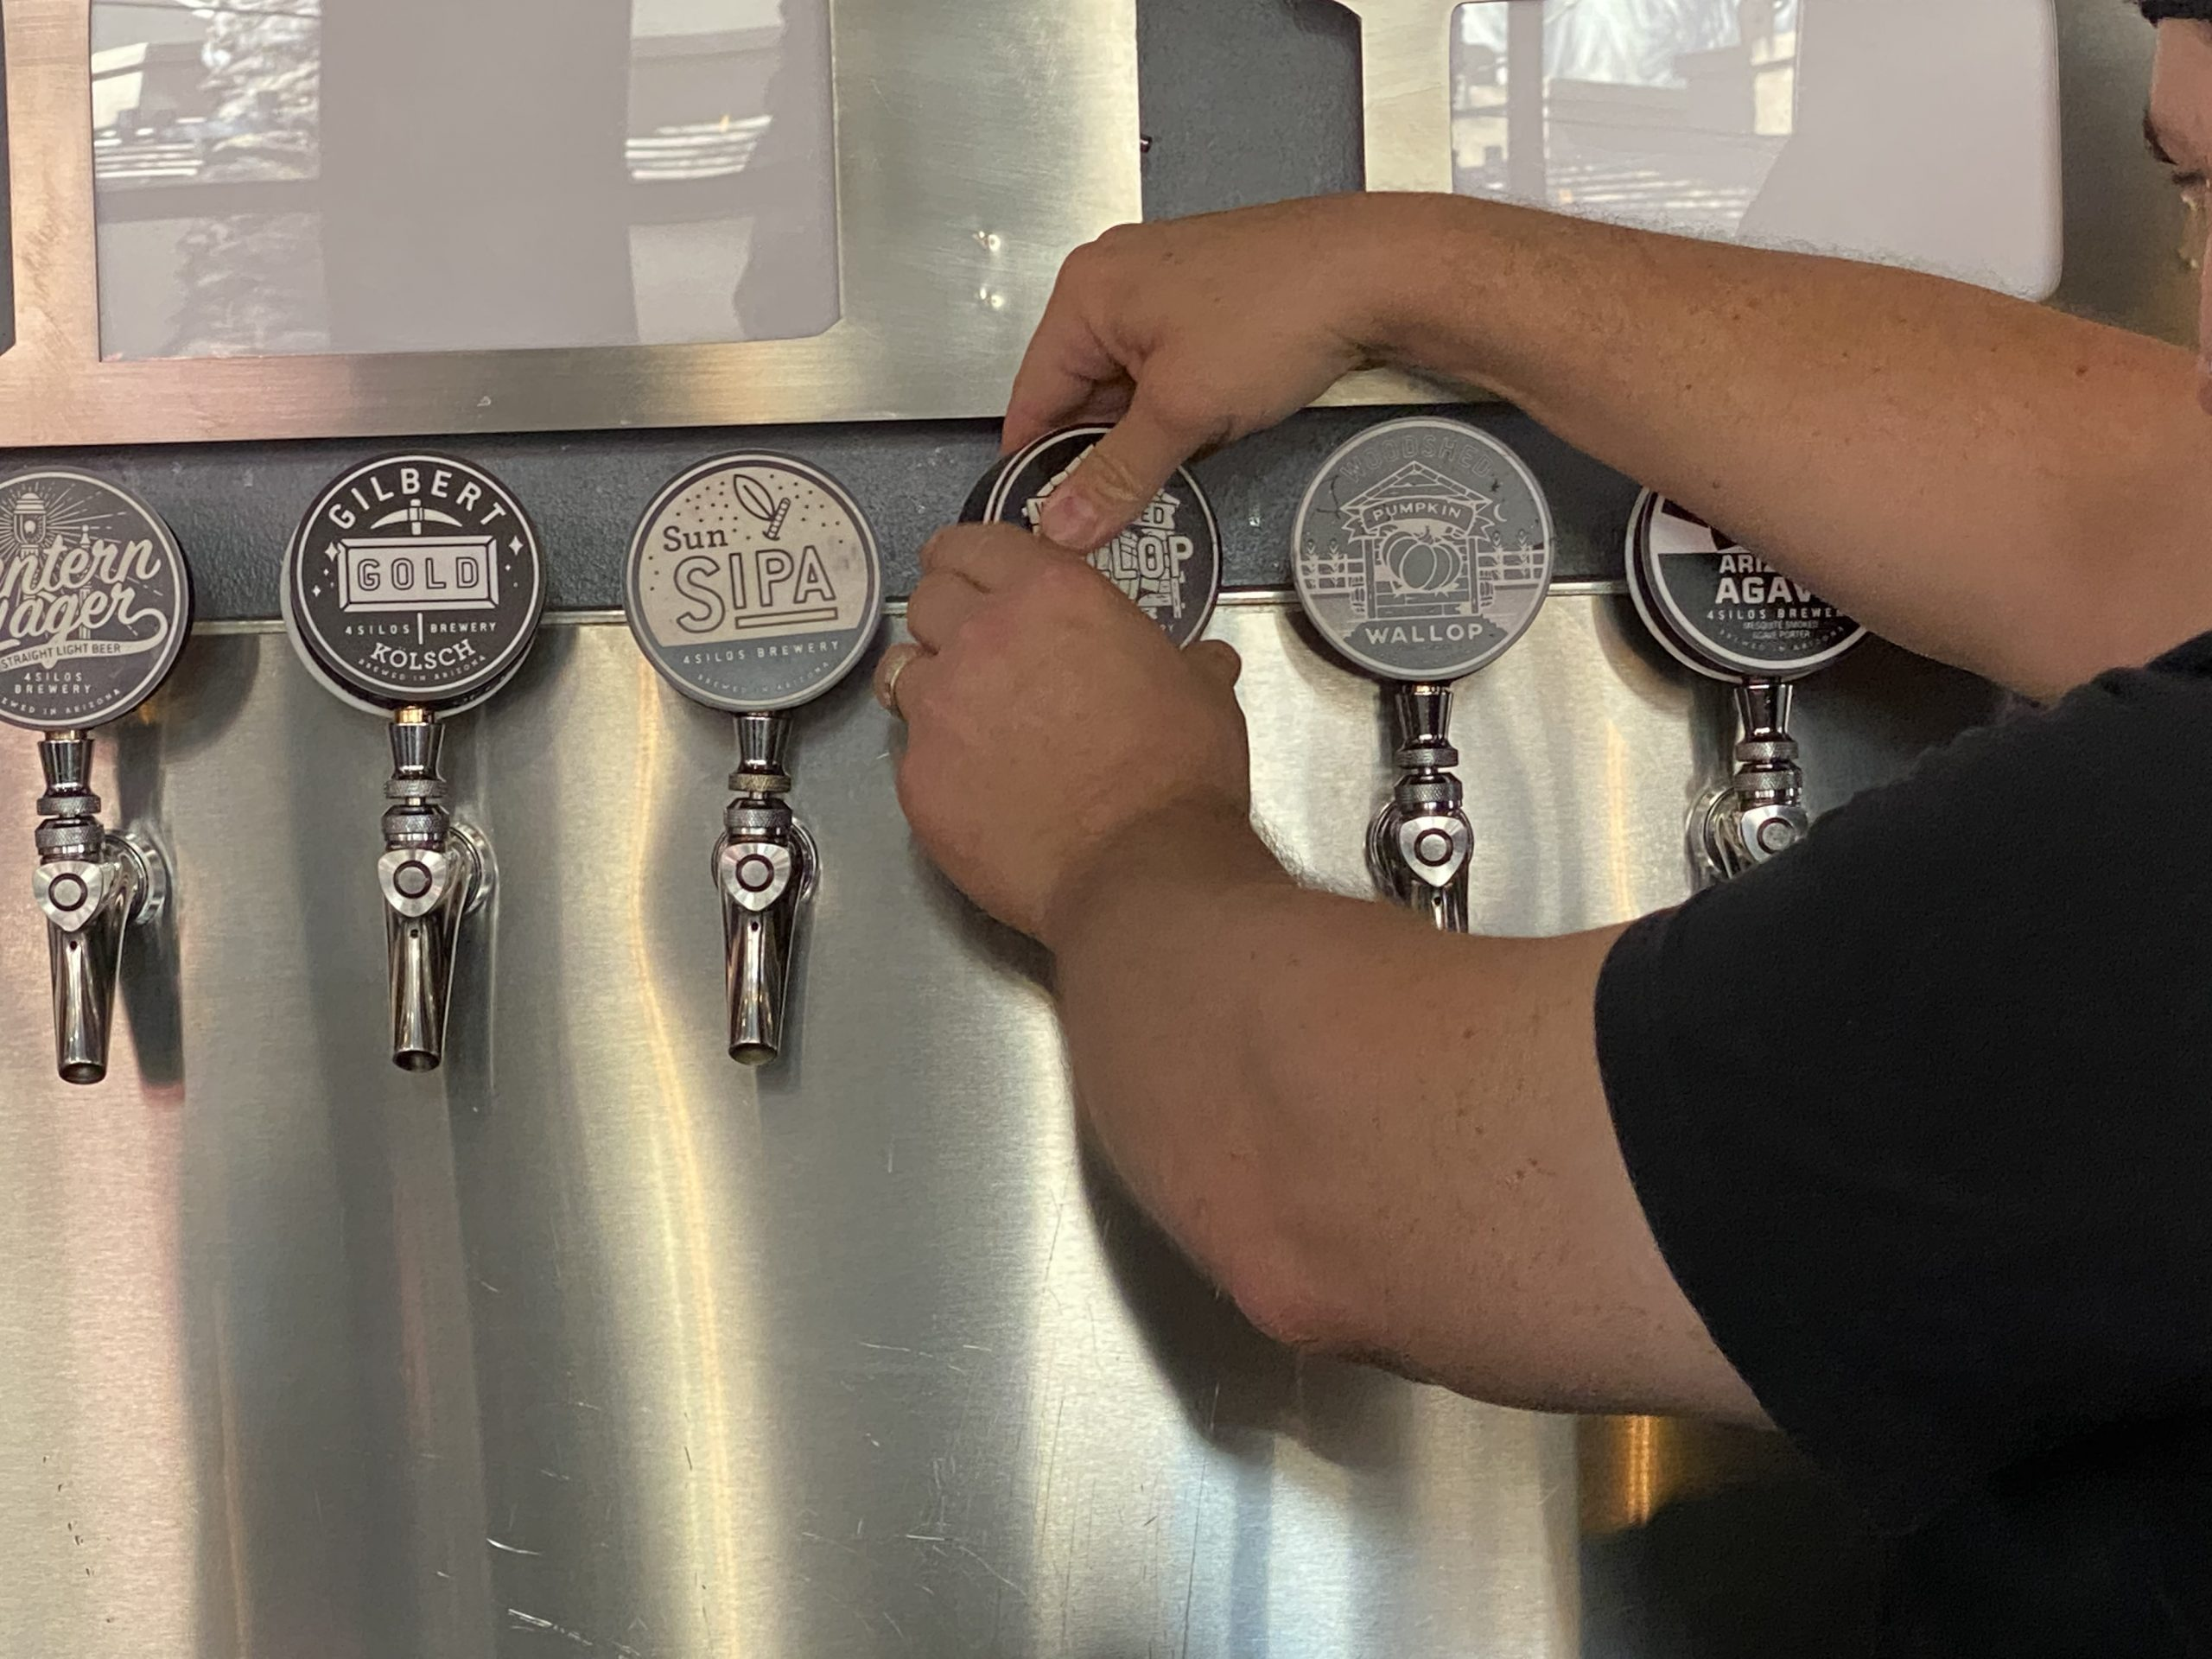 Tap handles at Four Silos.